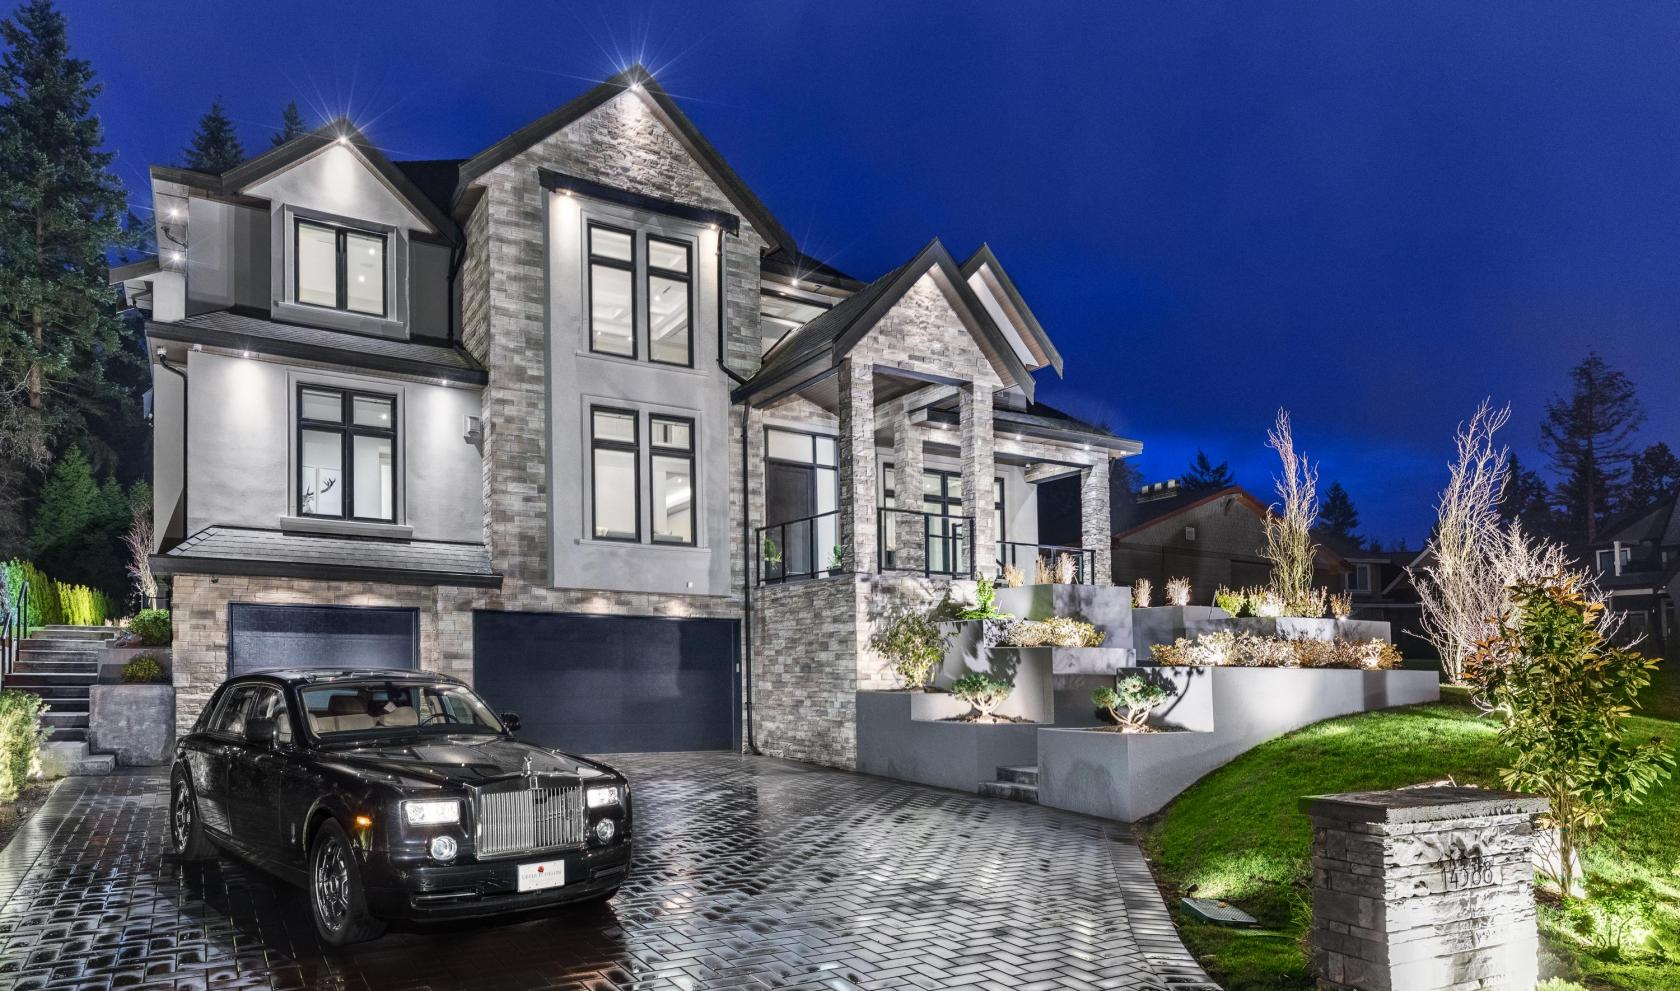 14388 27 Avenue, Elgin Chantrell, South Surrey White Rock